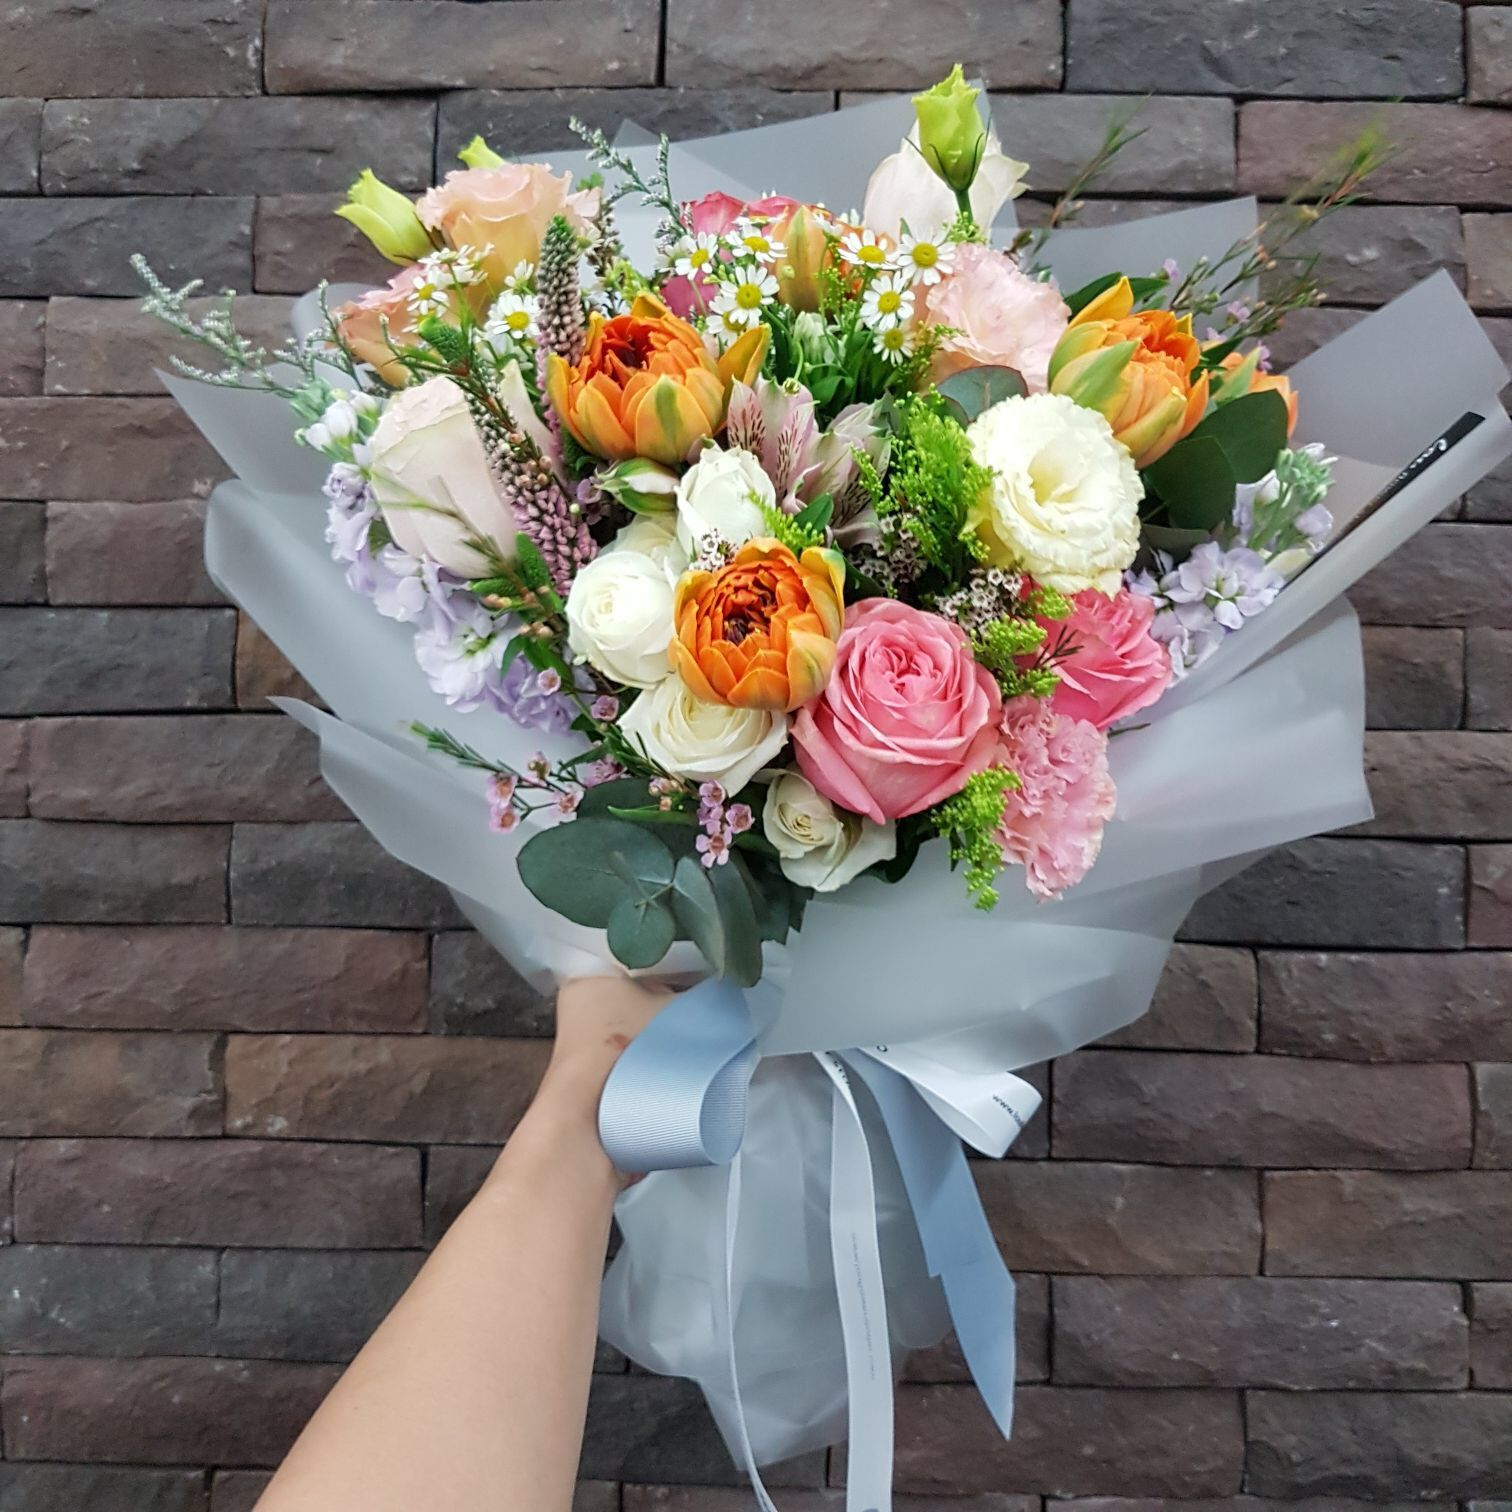 Garden Bouquet Of Tulips Roses Eustoma Veronica Flowers Bouquet Gift Flowers Bouquet Luxury Flowers